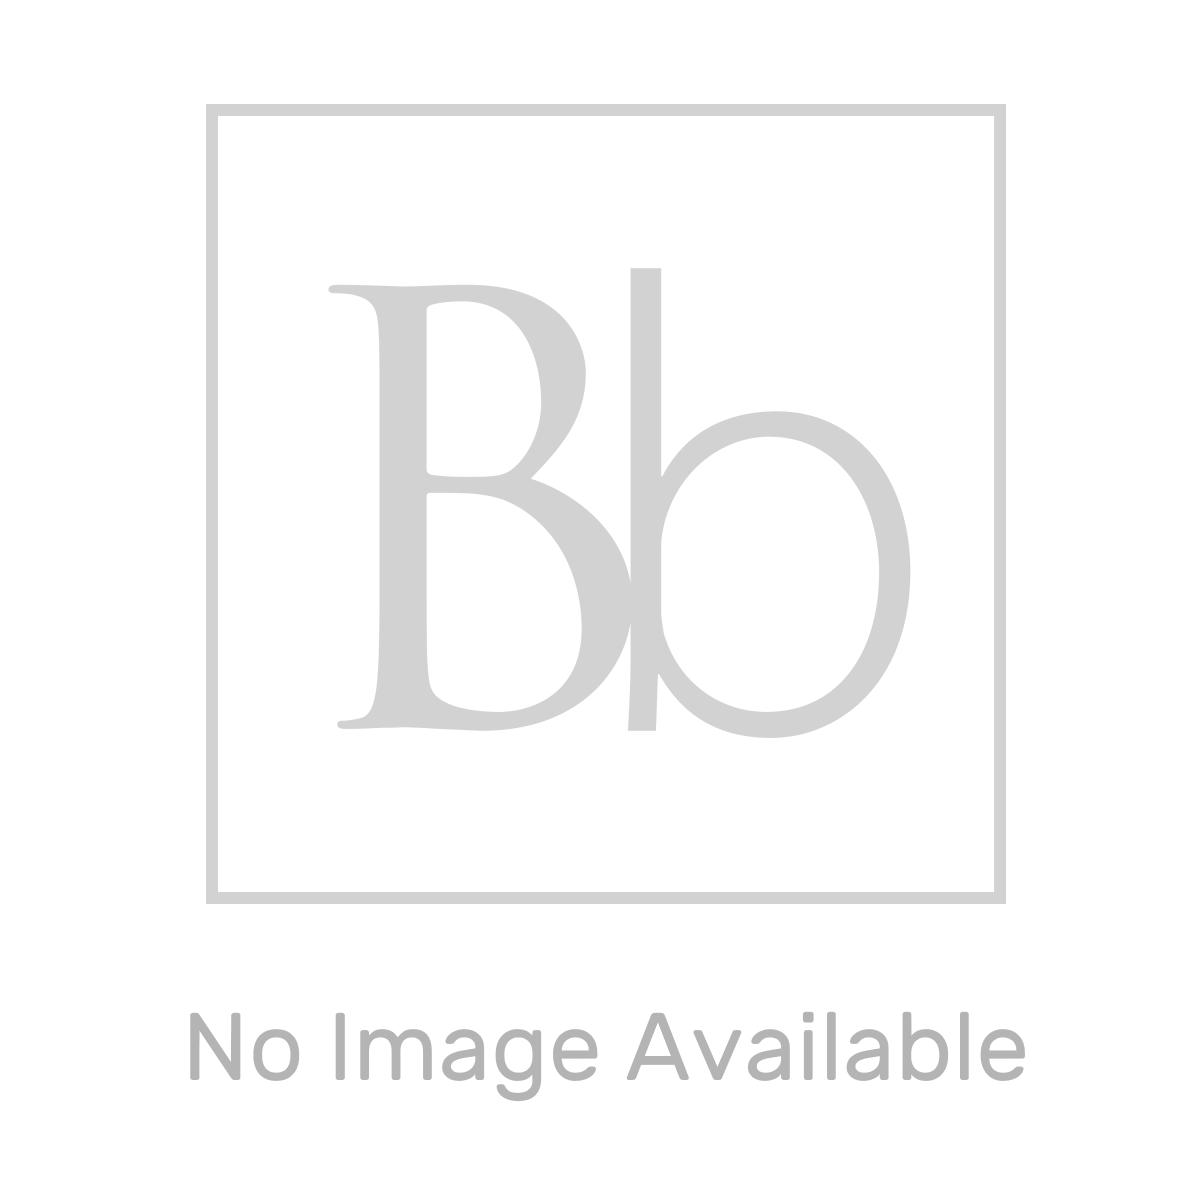 RAK Surface Mid Grey Lappato Tile 750 x 750mm Lifestyle